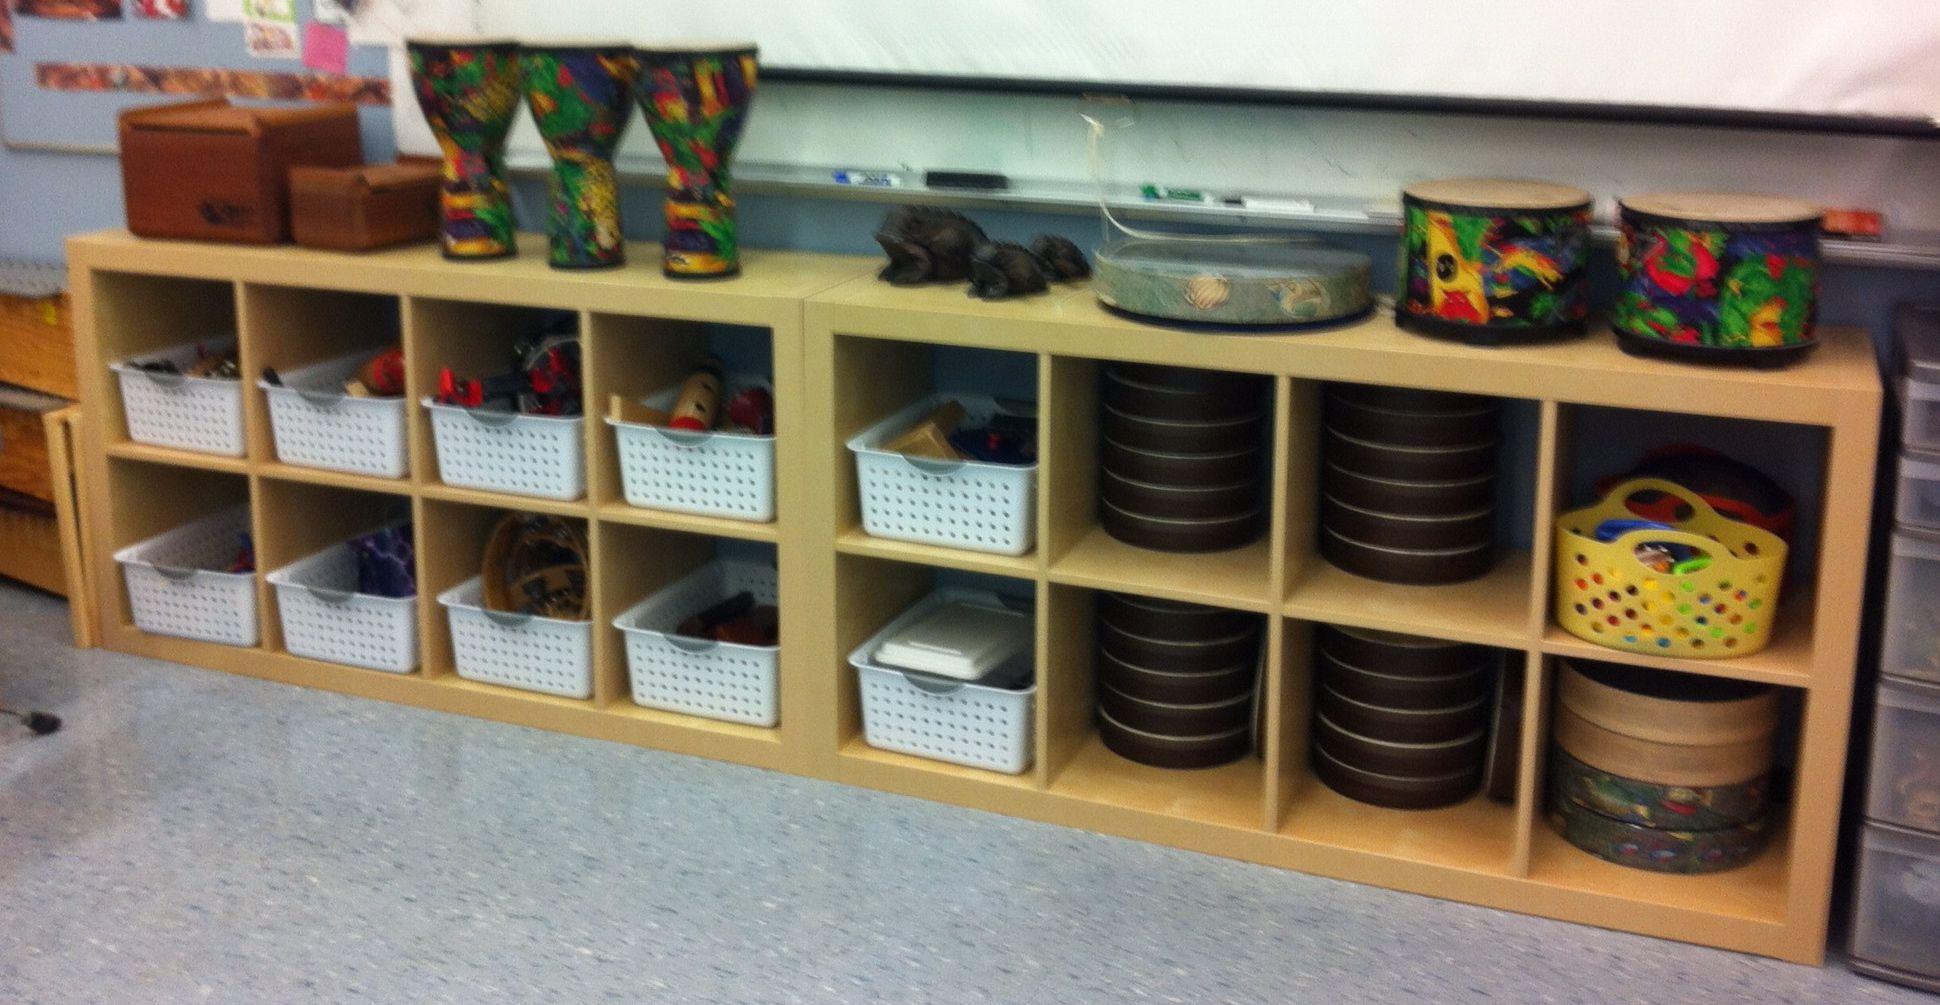 Genius Idea Ikea Expedit Shelves With Baskets For Storage: Elementary Music Room Storage / Organization. Ikea EXPEDIT